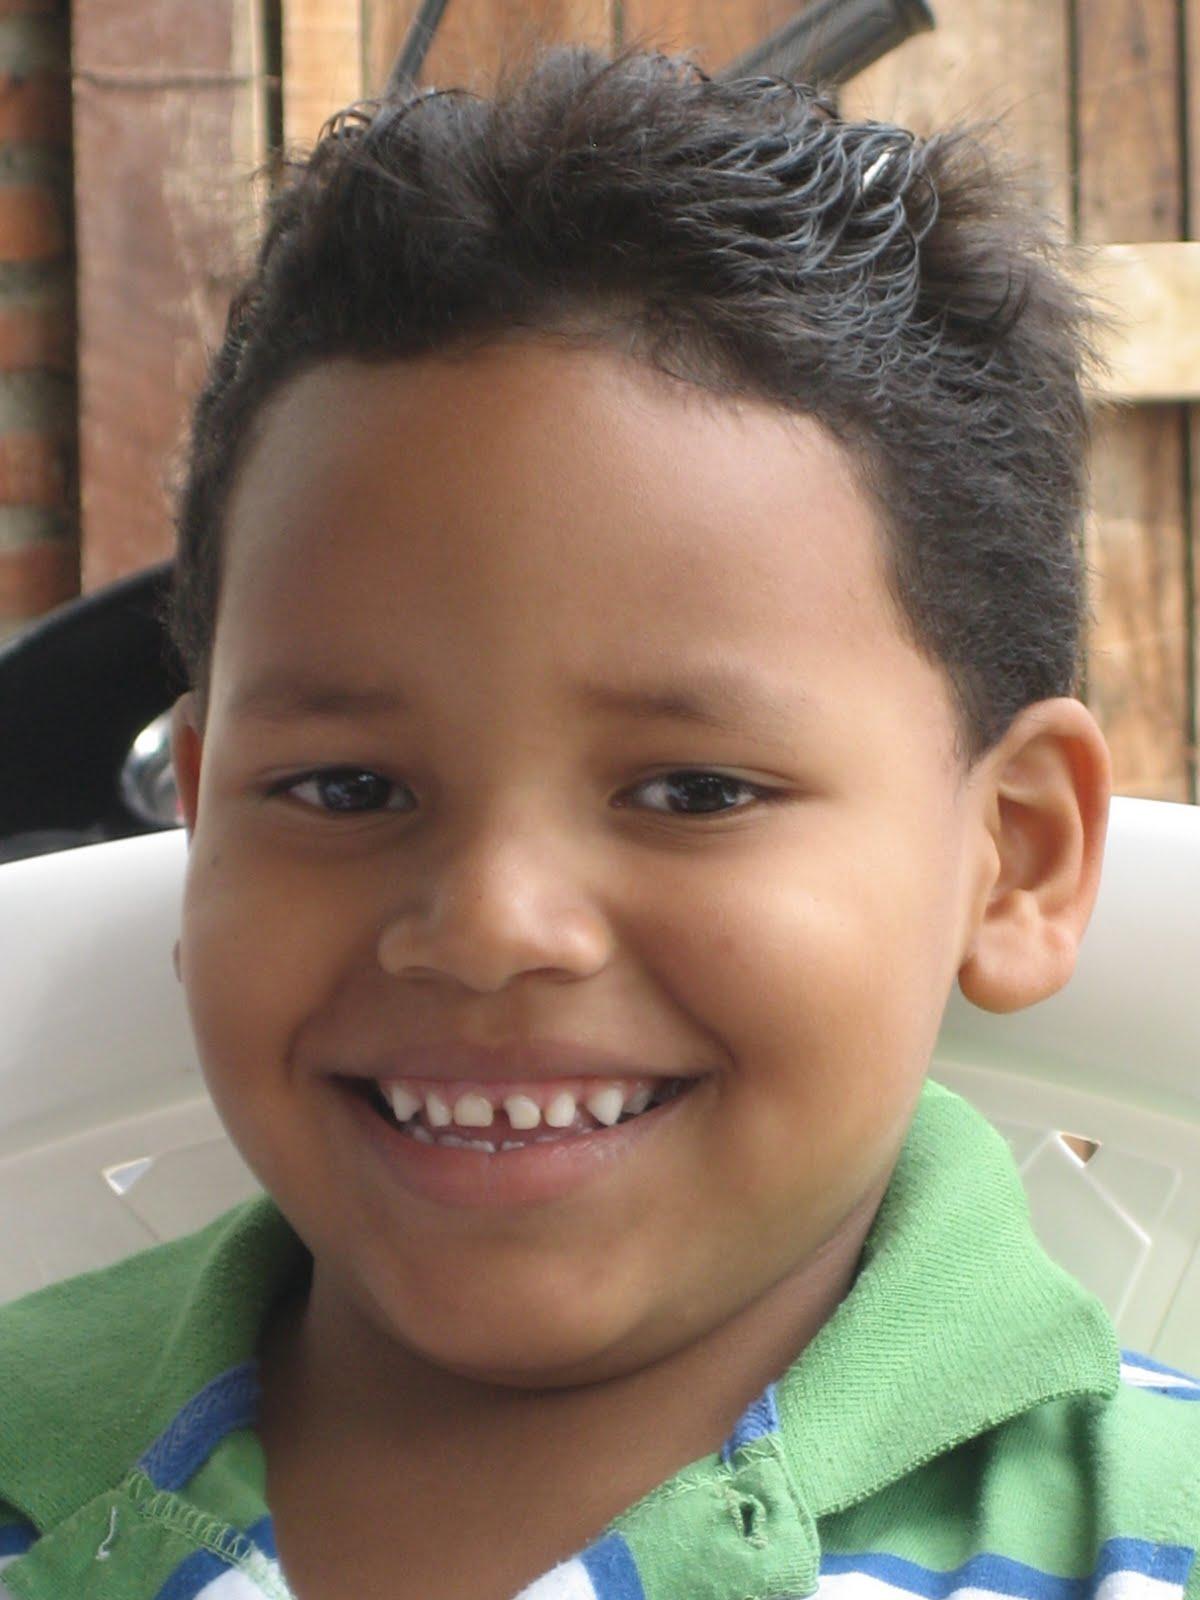 YO PADRINO-FUNDACION VIVIR: ROBINSON ALEXIS MORENO RUCCO